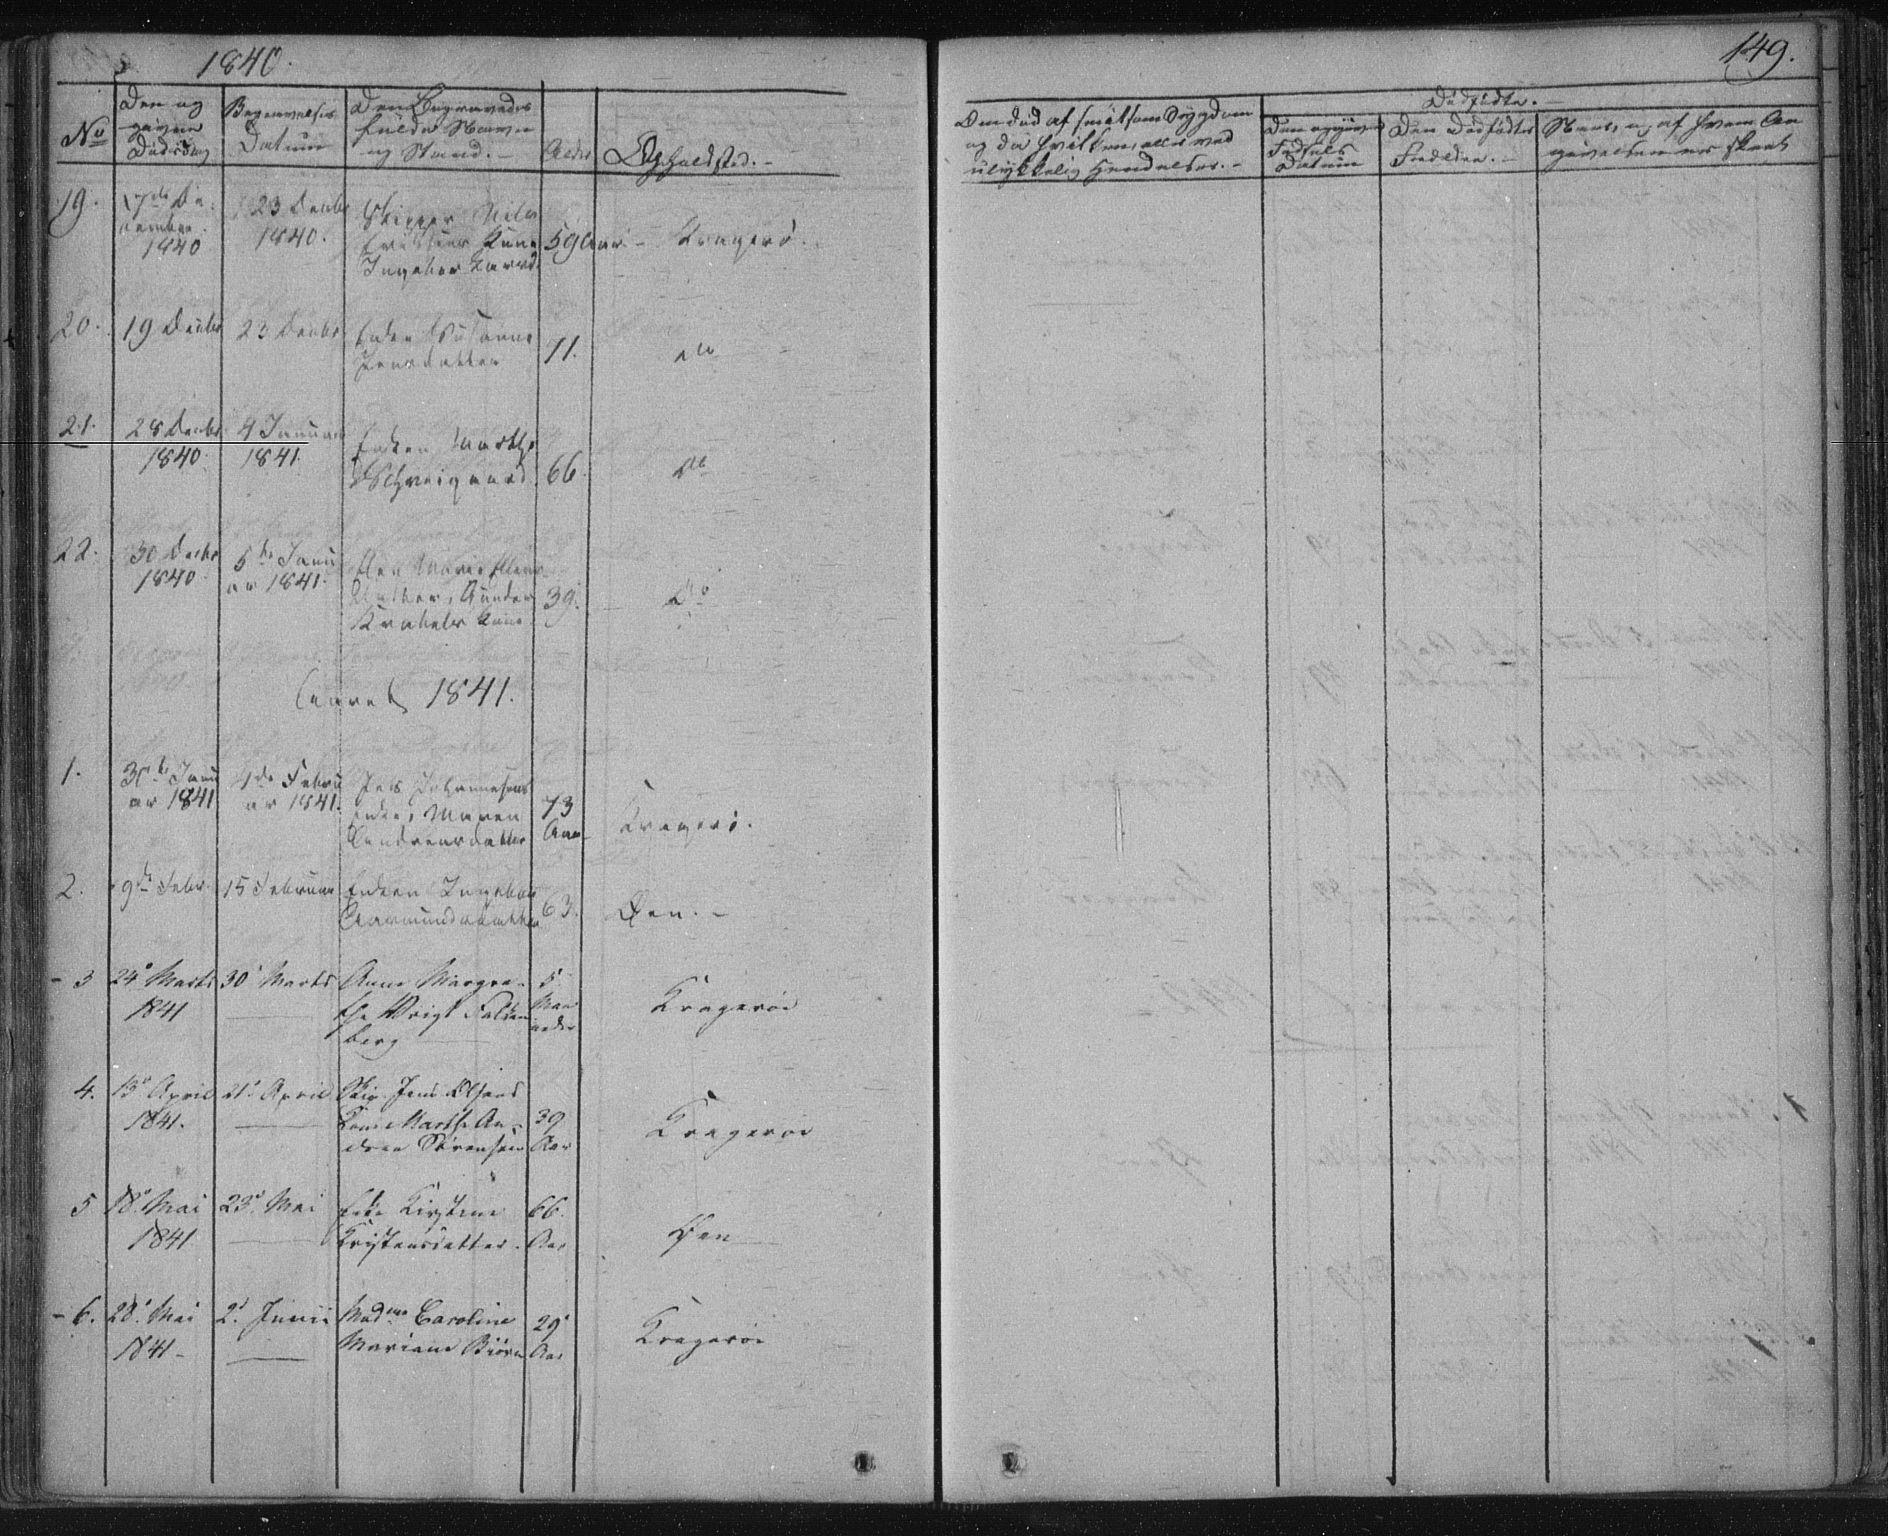 SAKO, Kragerø kirkebøker, F/Fa/L0005: Ministerialbok nr. 5, 1832-1847, s. 149